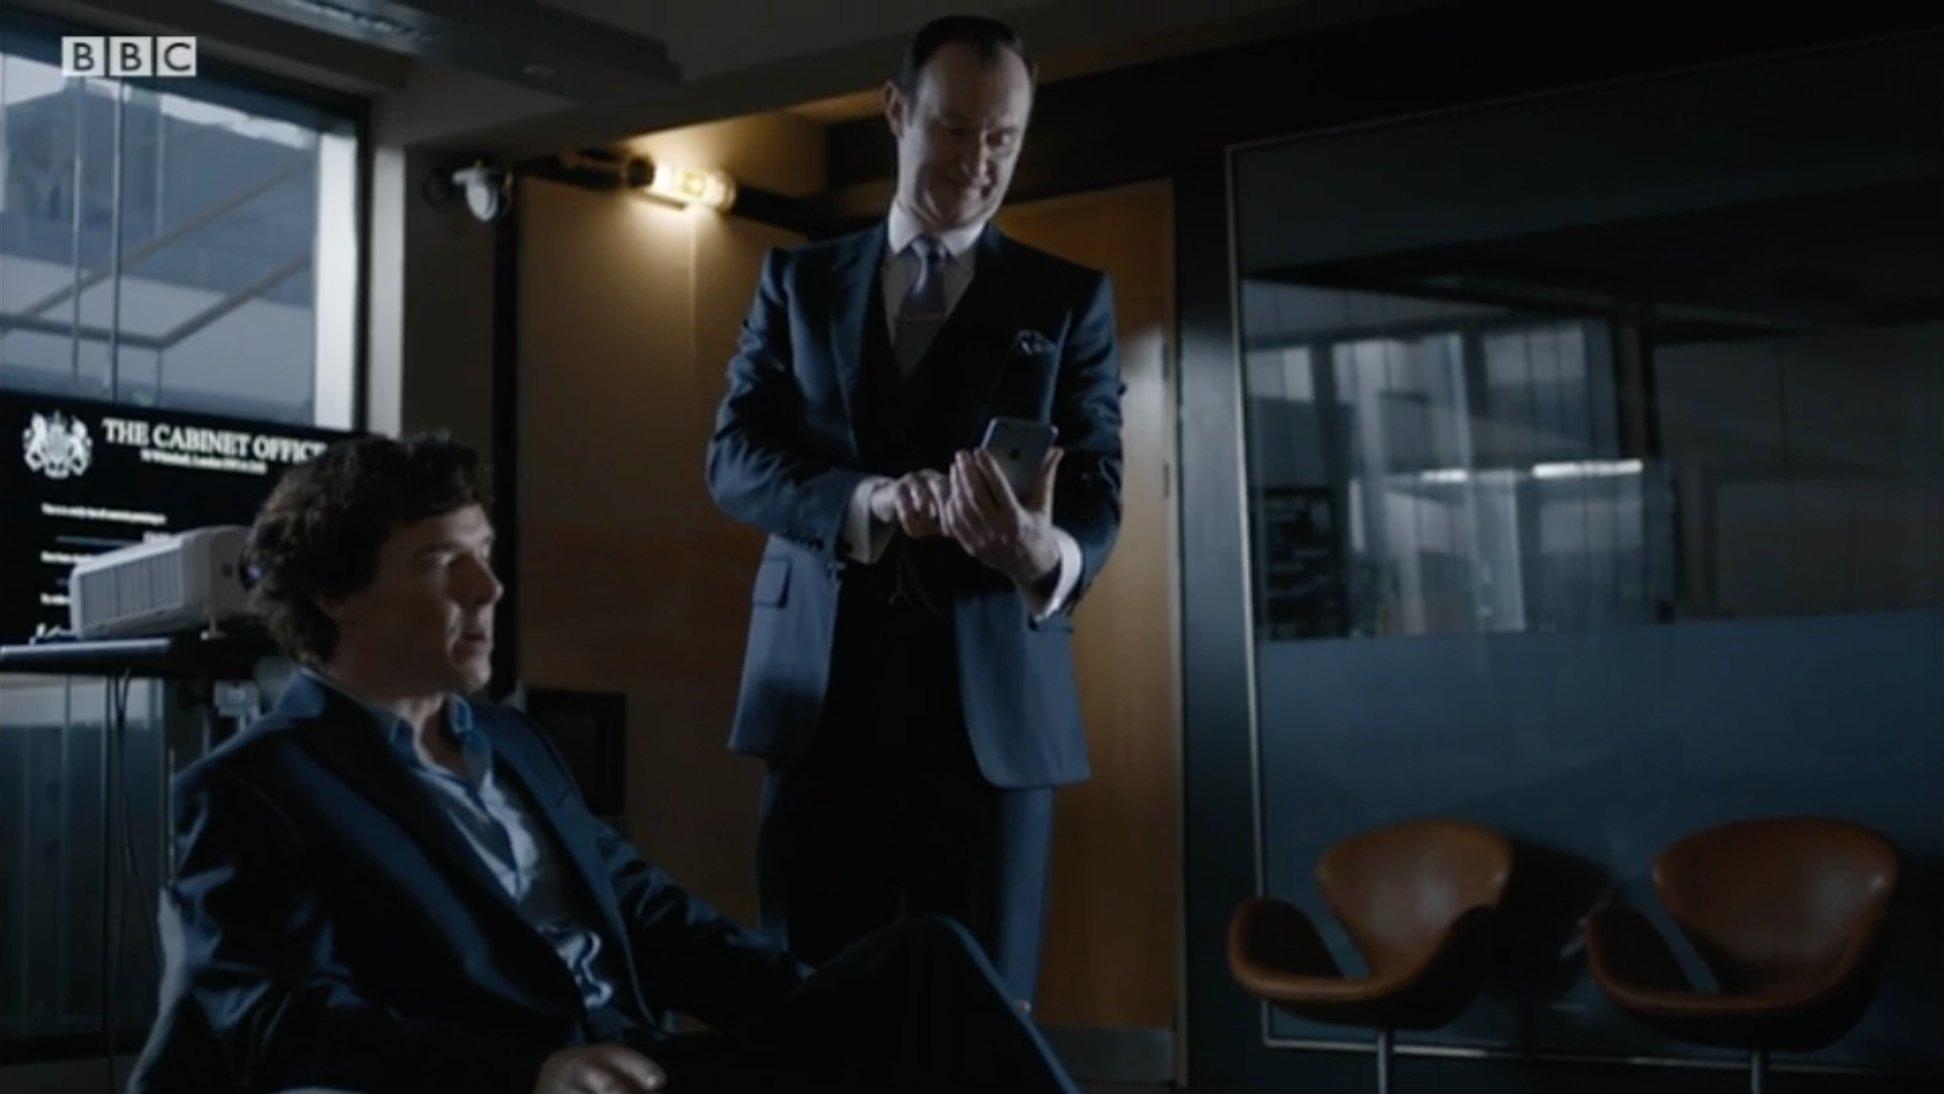 """Are you tweeting??""  #Sherlock https://t.co/wGkmVD34Pg"